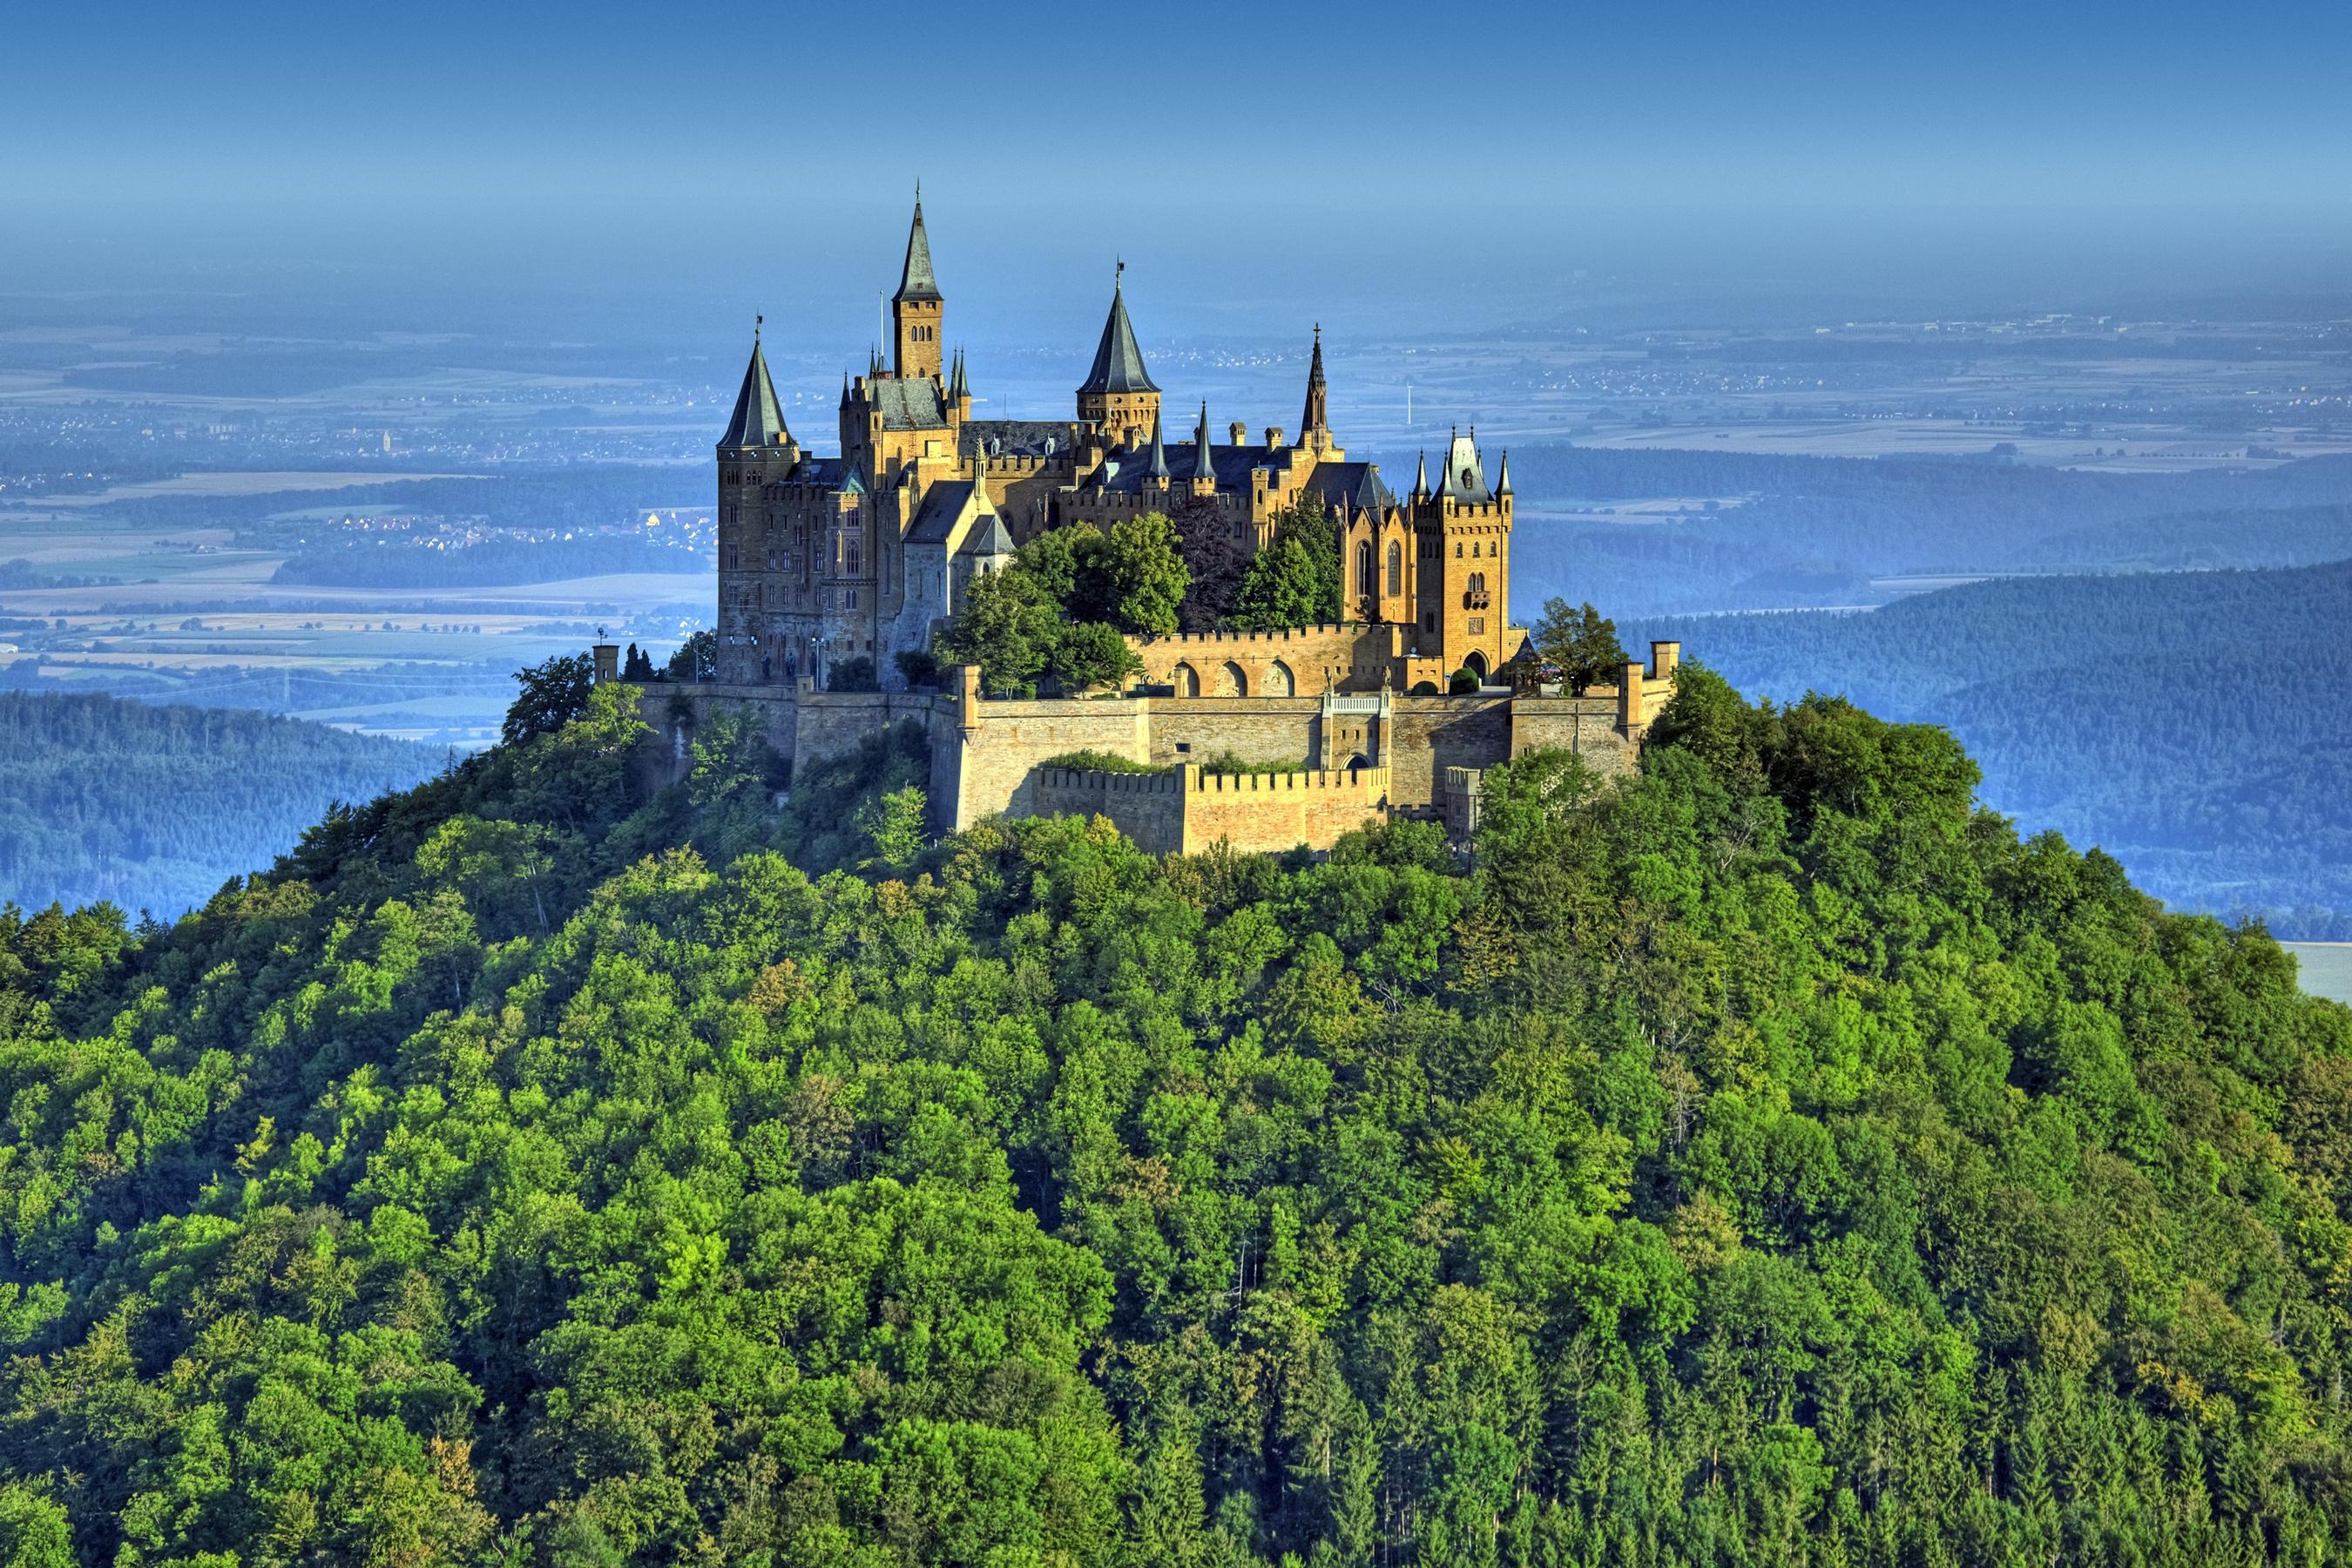 Burg_Hohenzollern_castle_замок_Германии